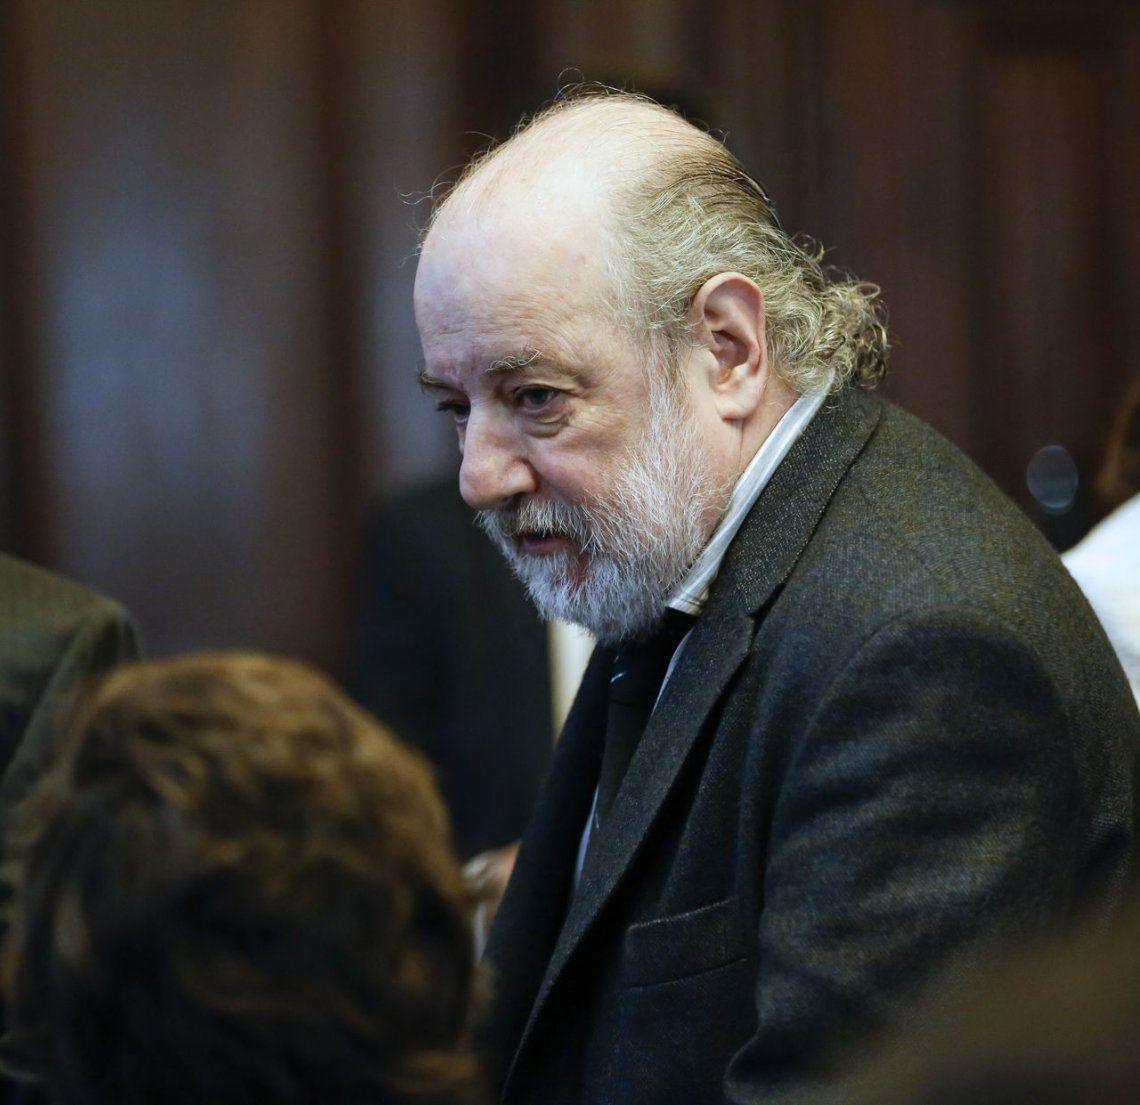 Siguen las indagatorias: hoy declaran dos hombres cercanos a los Kirchner